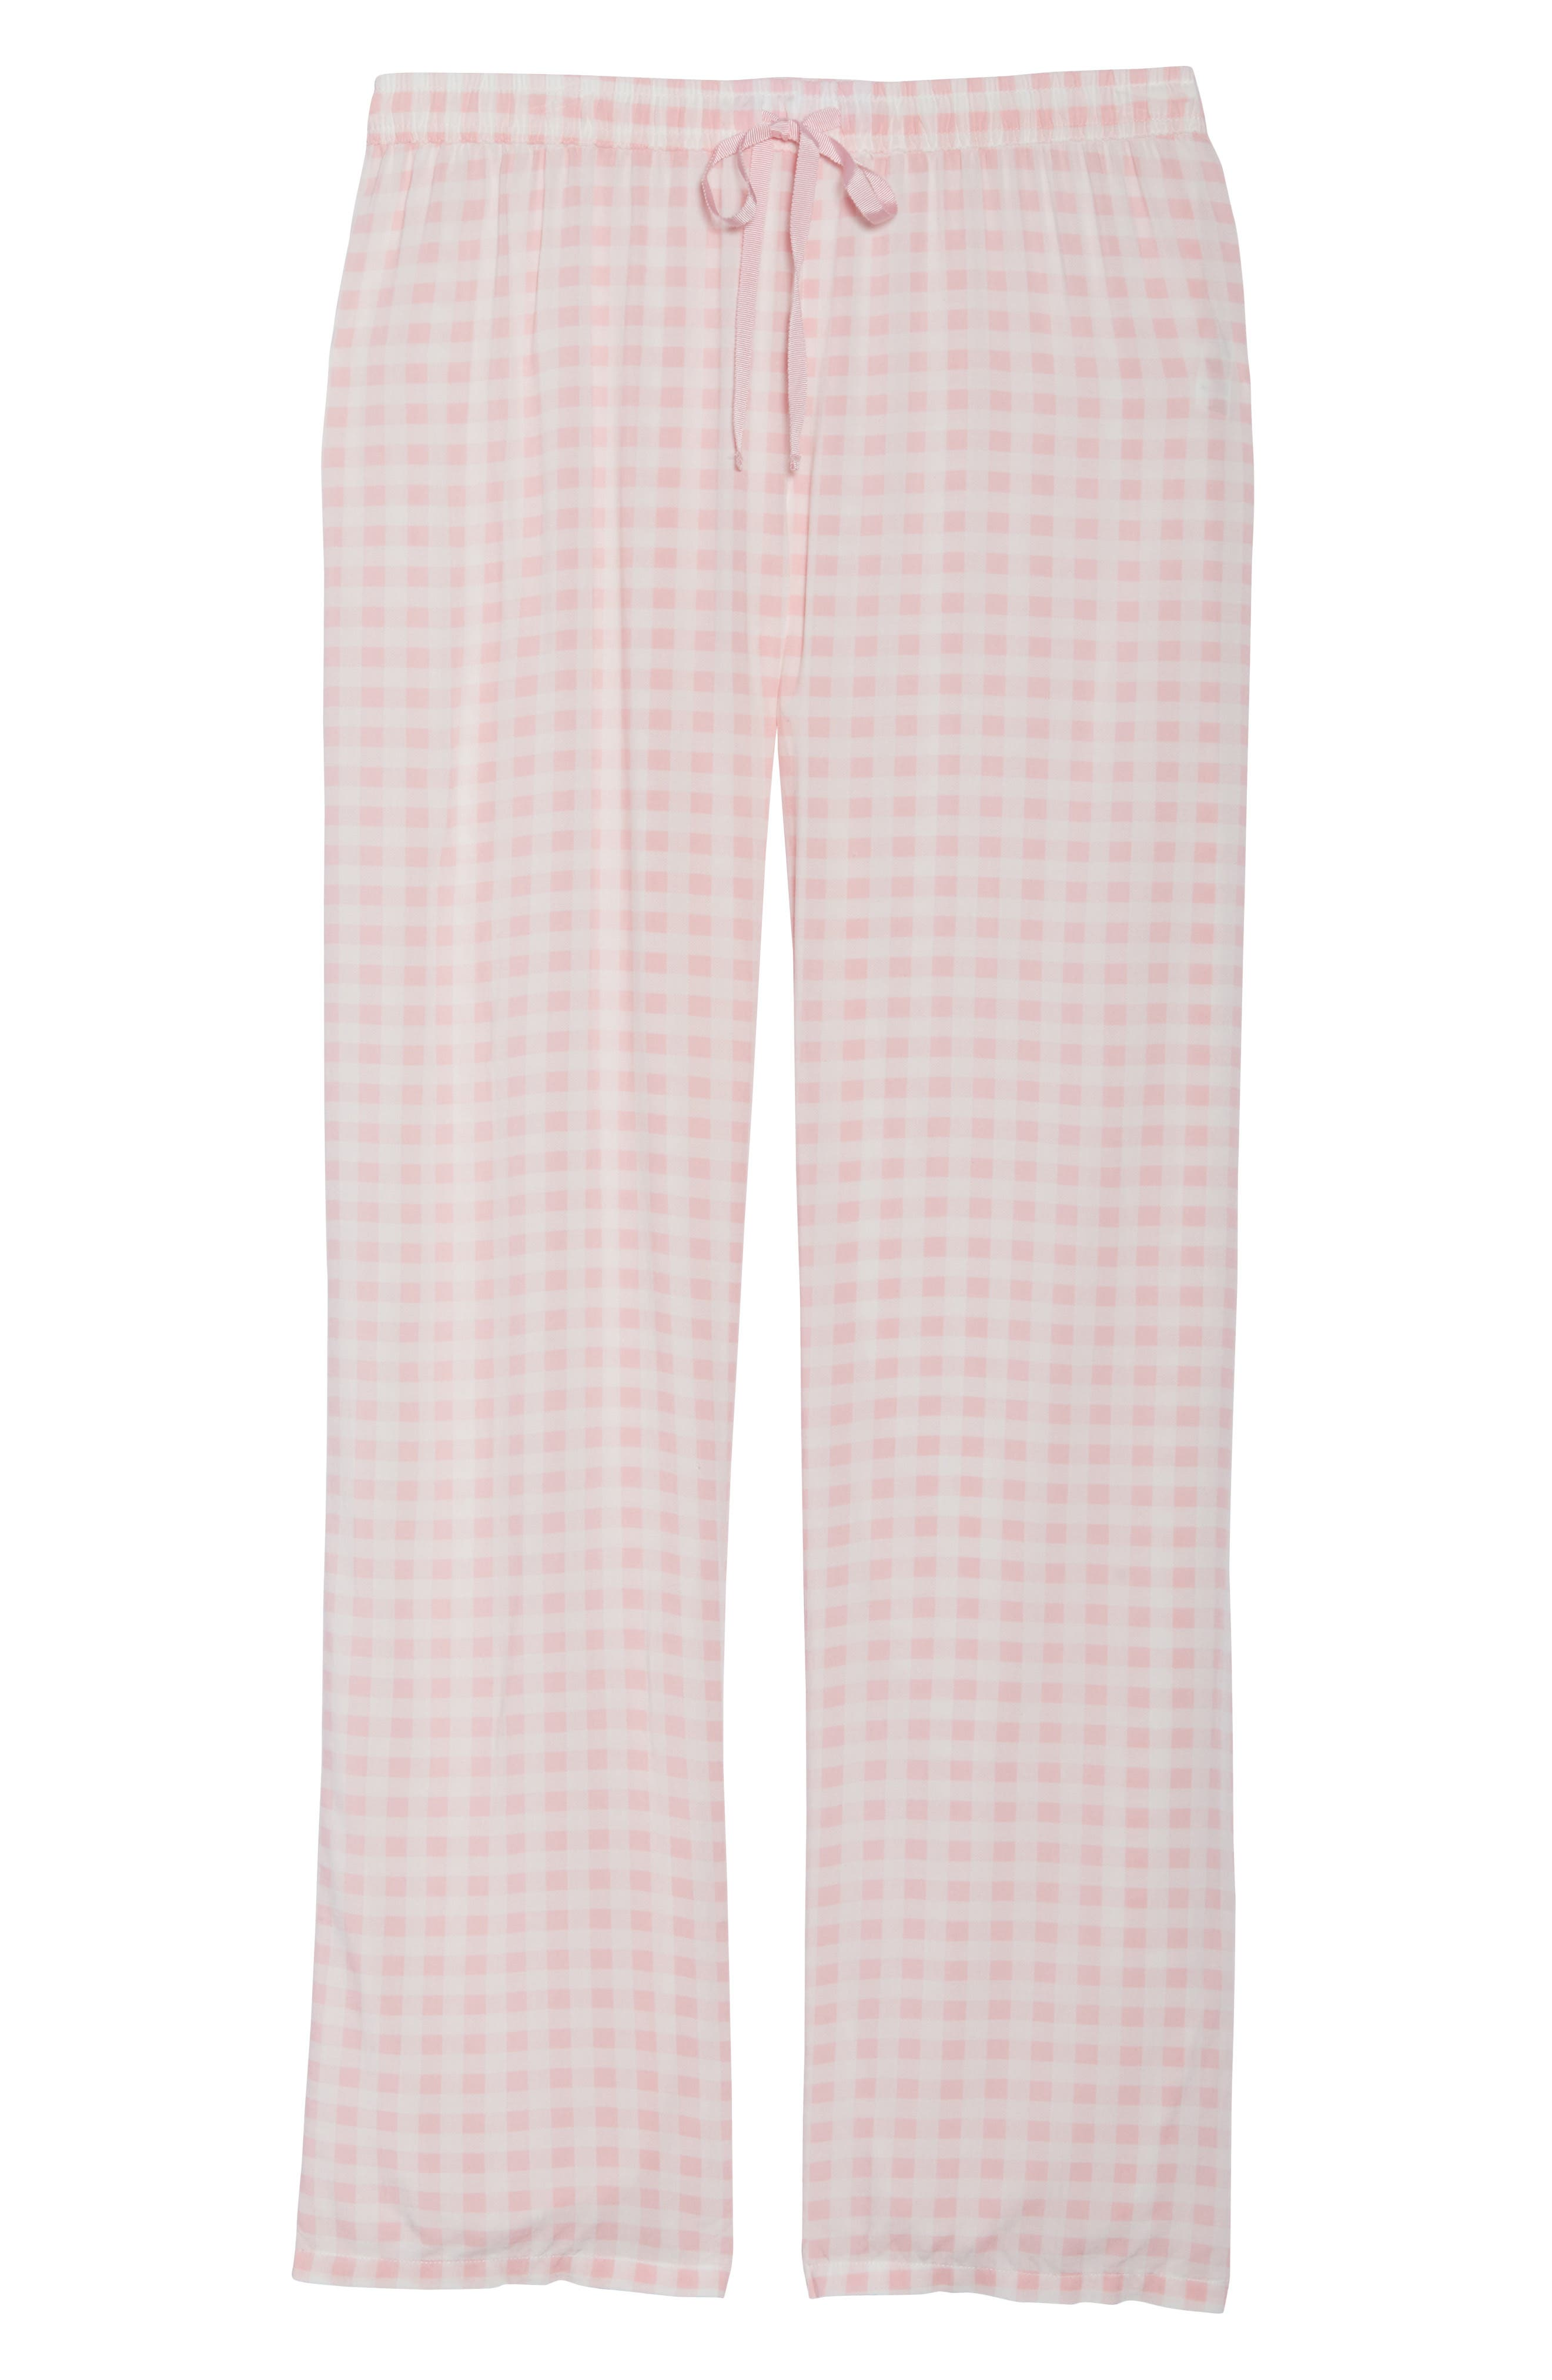 Gingham Pajama Pants,                             Alternate thumbnail 4, color,                             Pink